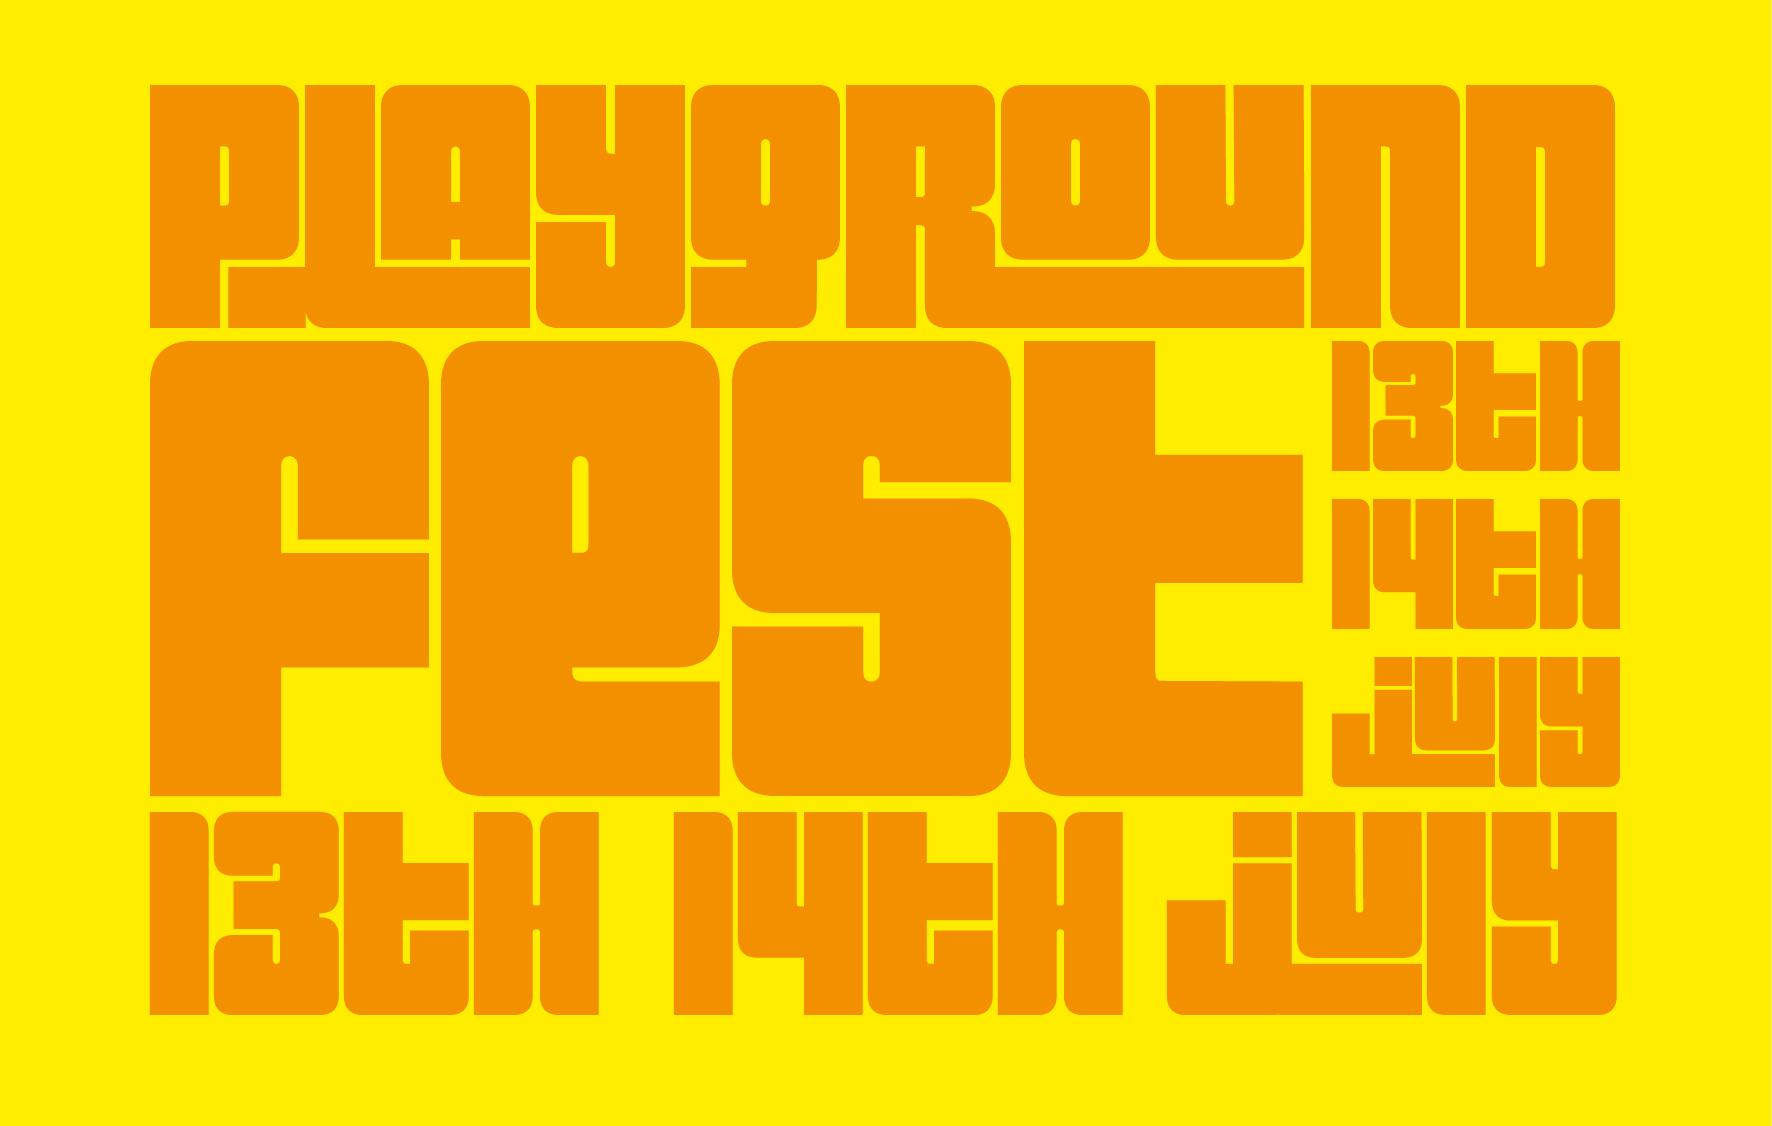 playgroundfest final logo landscape.jpg